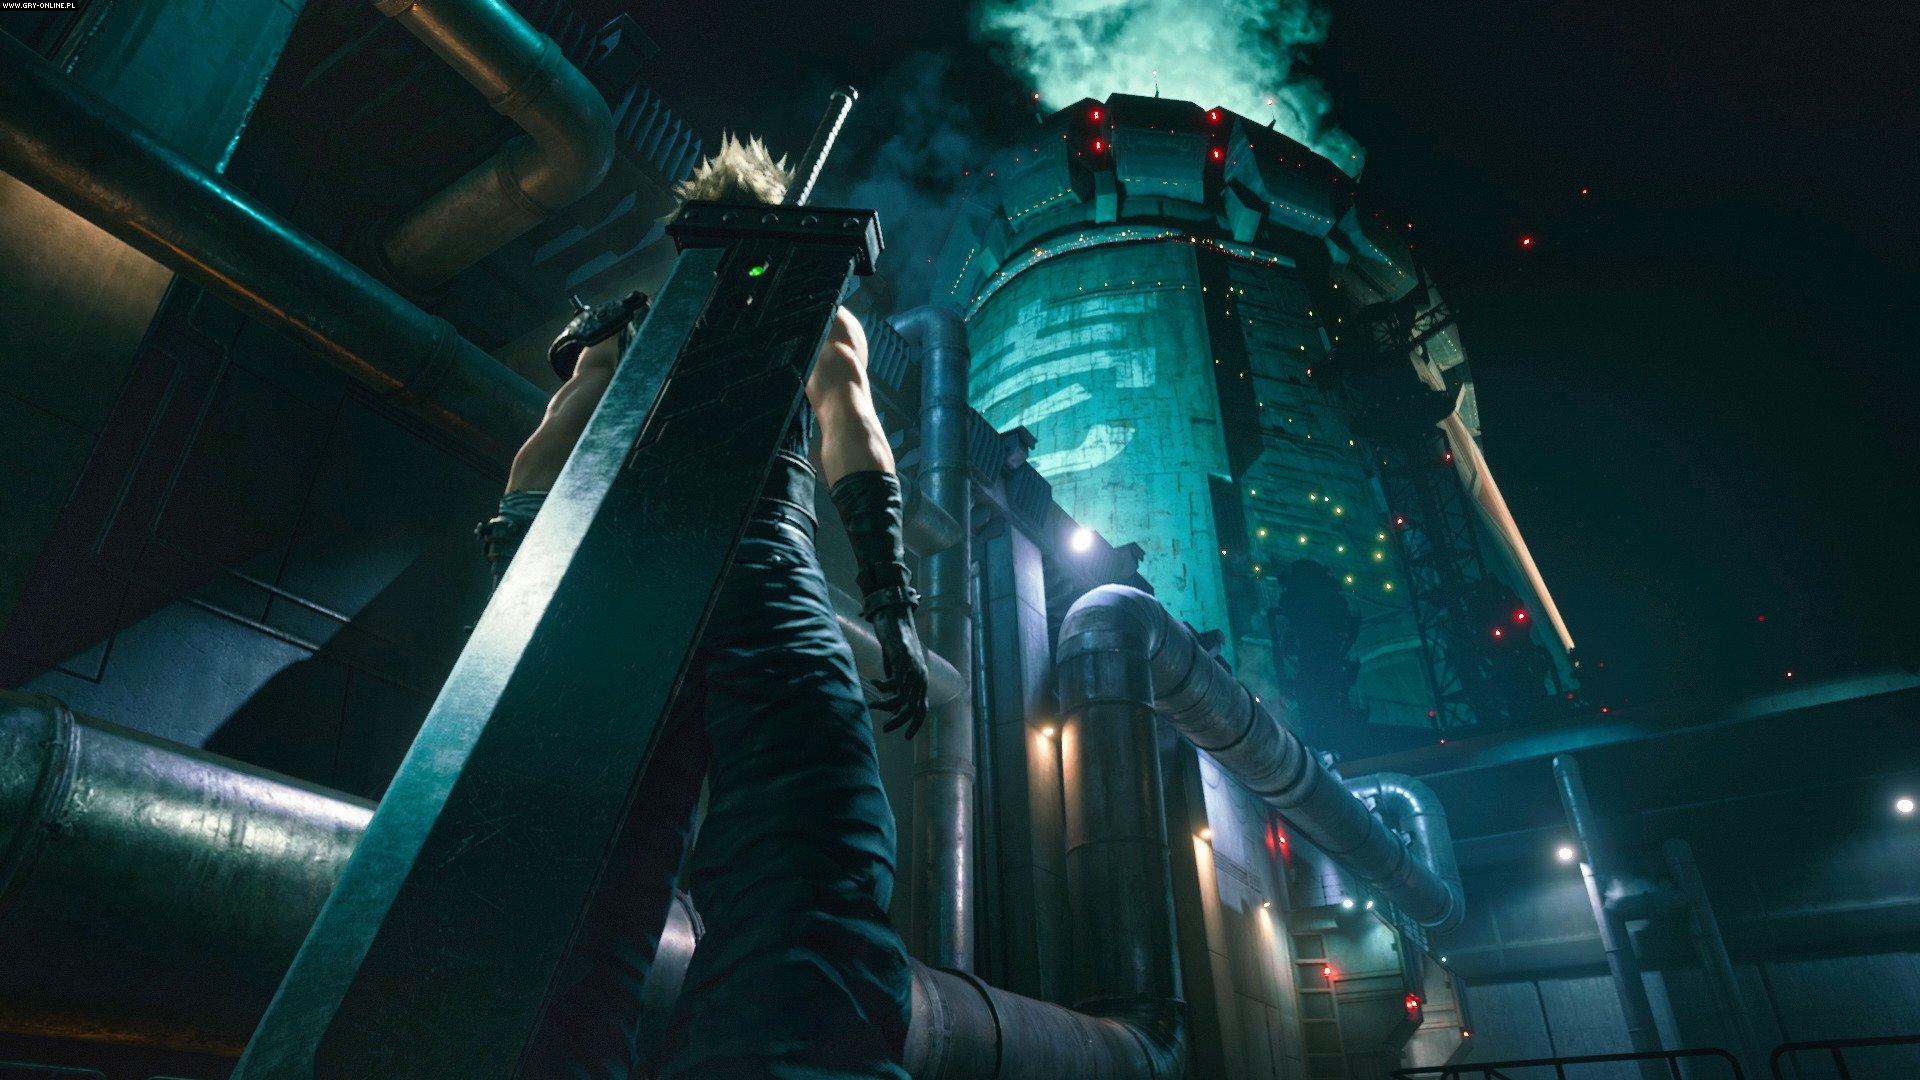 Final Fantasy VII Remake PS4 Games Image 15/28, Square-Enix / Eidos